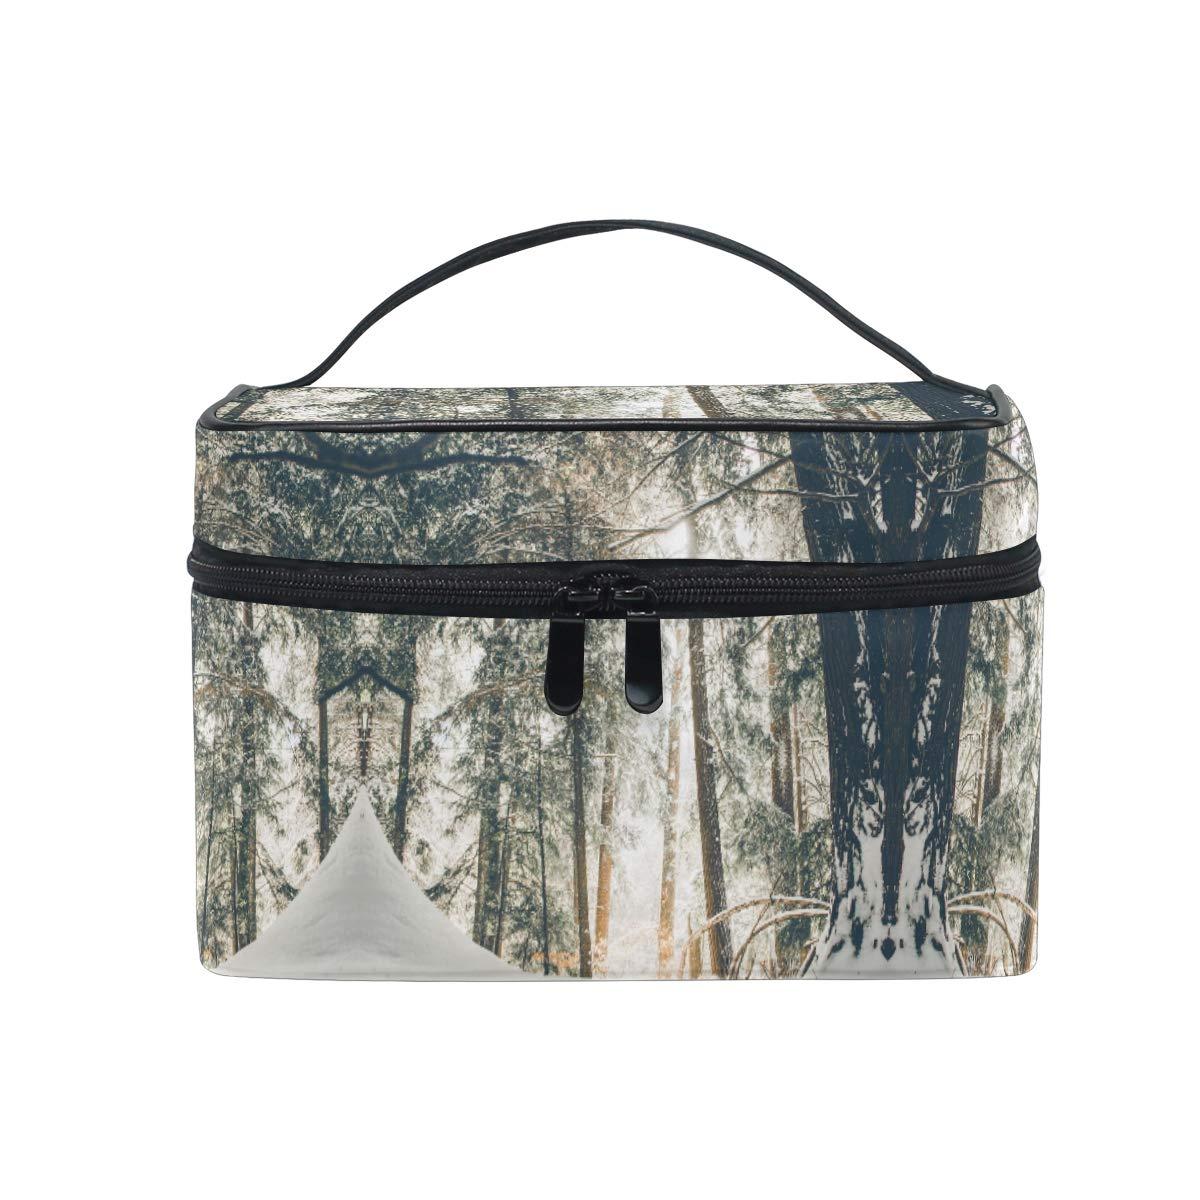 Large Travel Makeup Train Case Nature Winter Carrying Portable Zip Cosmetic Brush Bag Makeup Bag Organizer for Girls Women